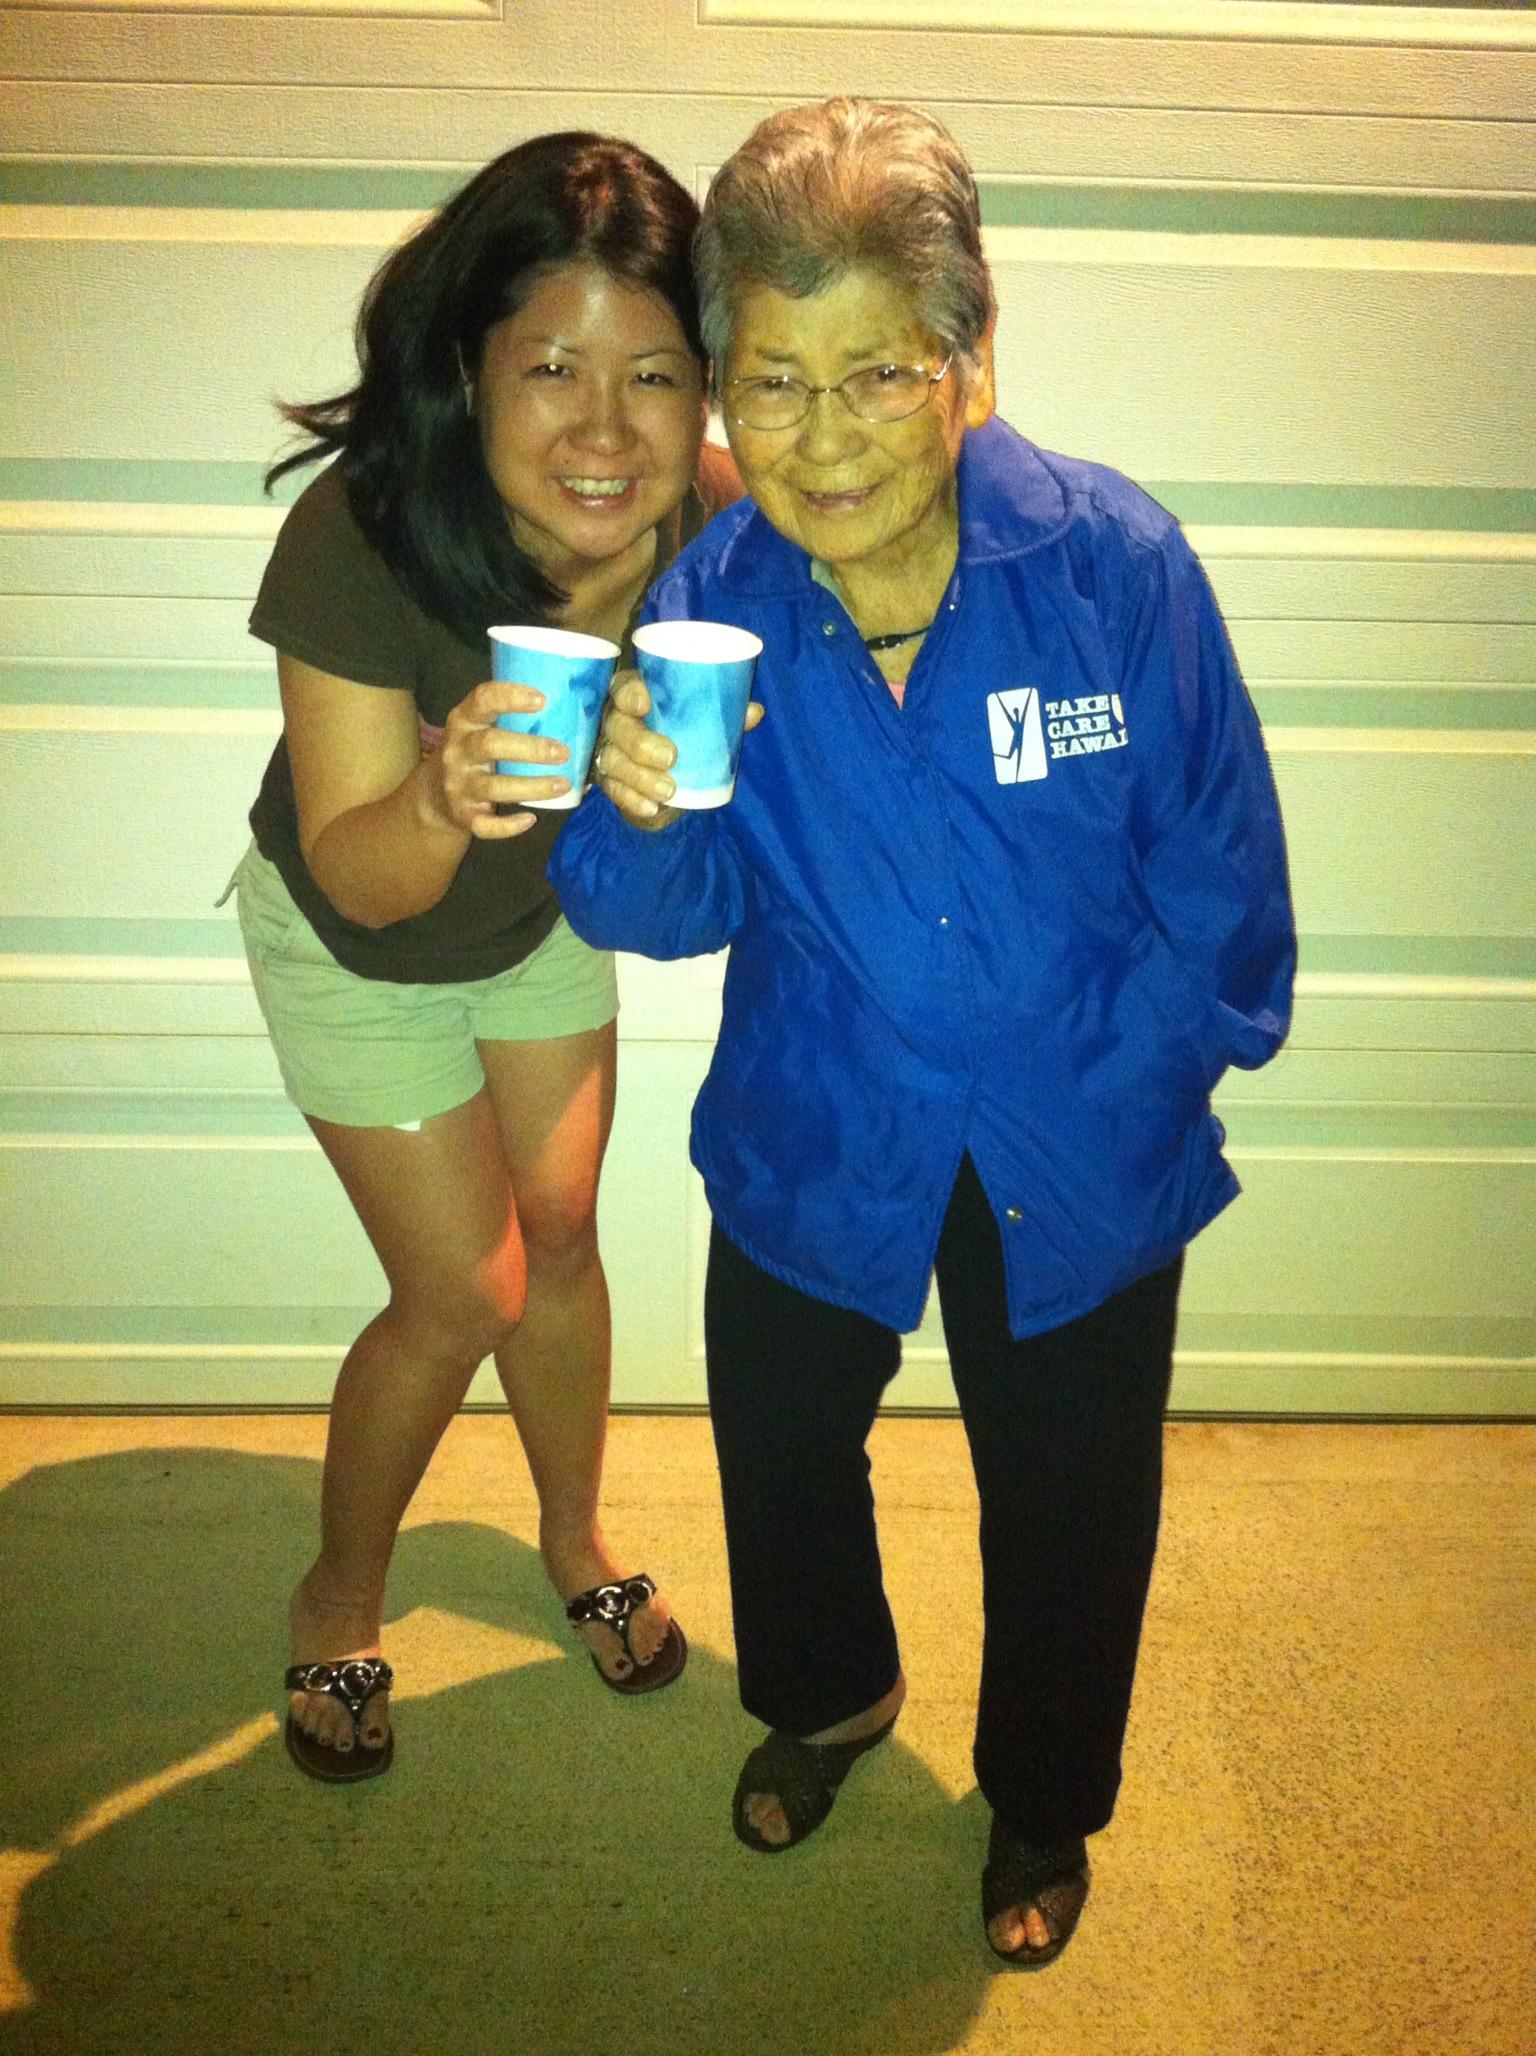 Founder Lori Shen and her 96 year old Grandma enjoying the start of 2019.